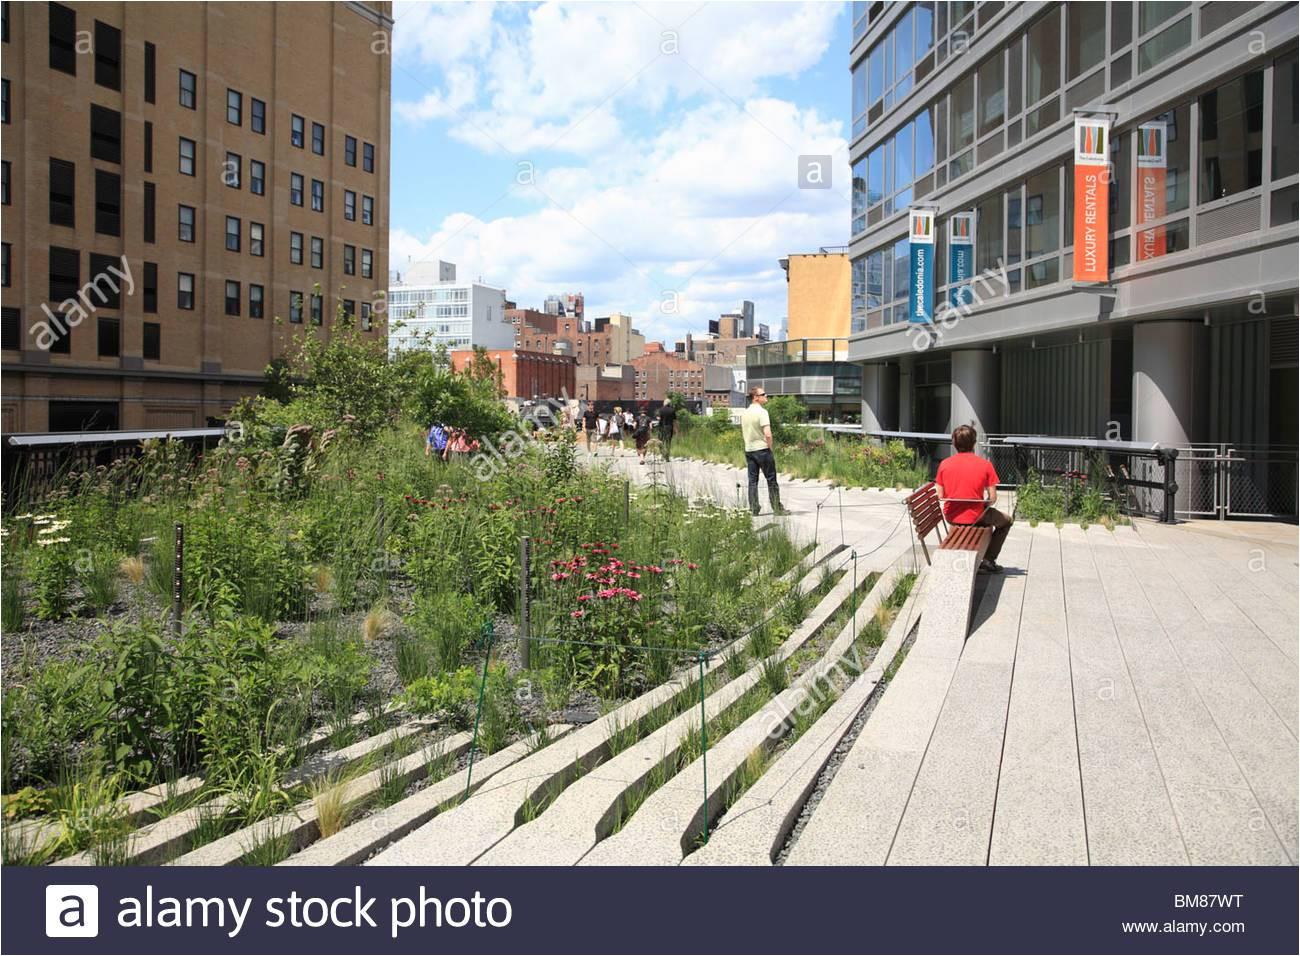 highline elevated public park on former rail tracks manhattan new york city usa